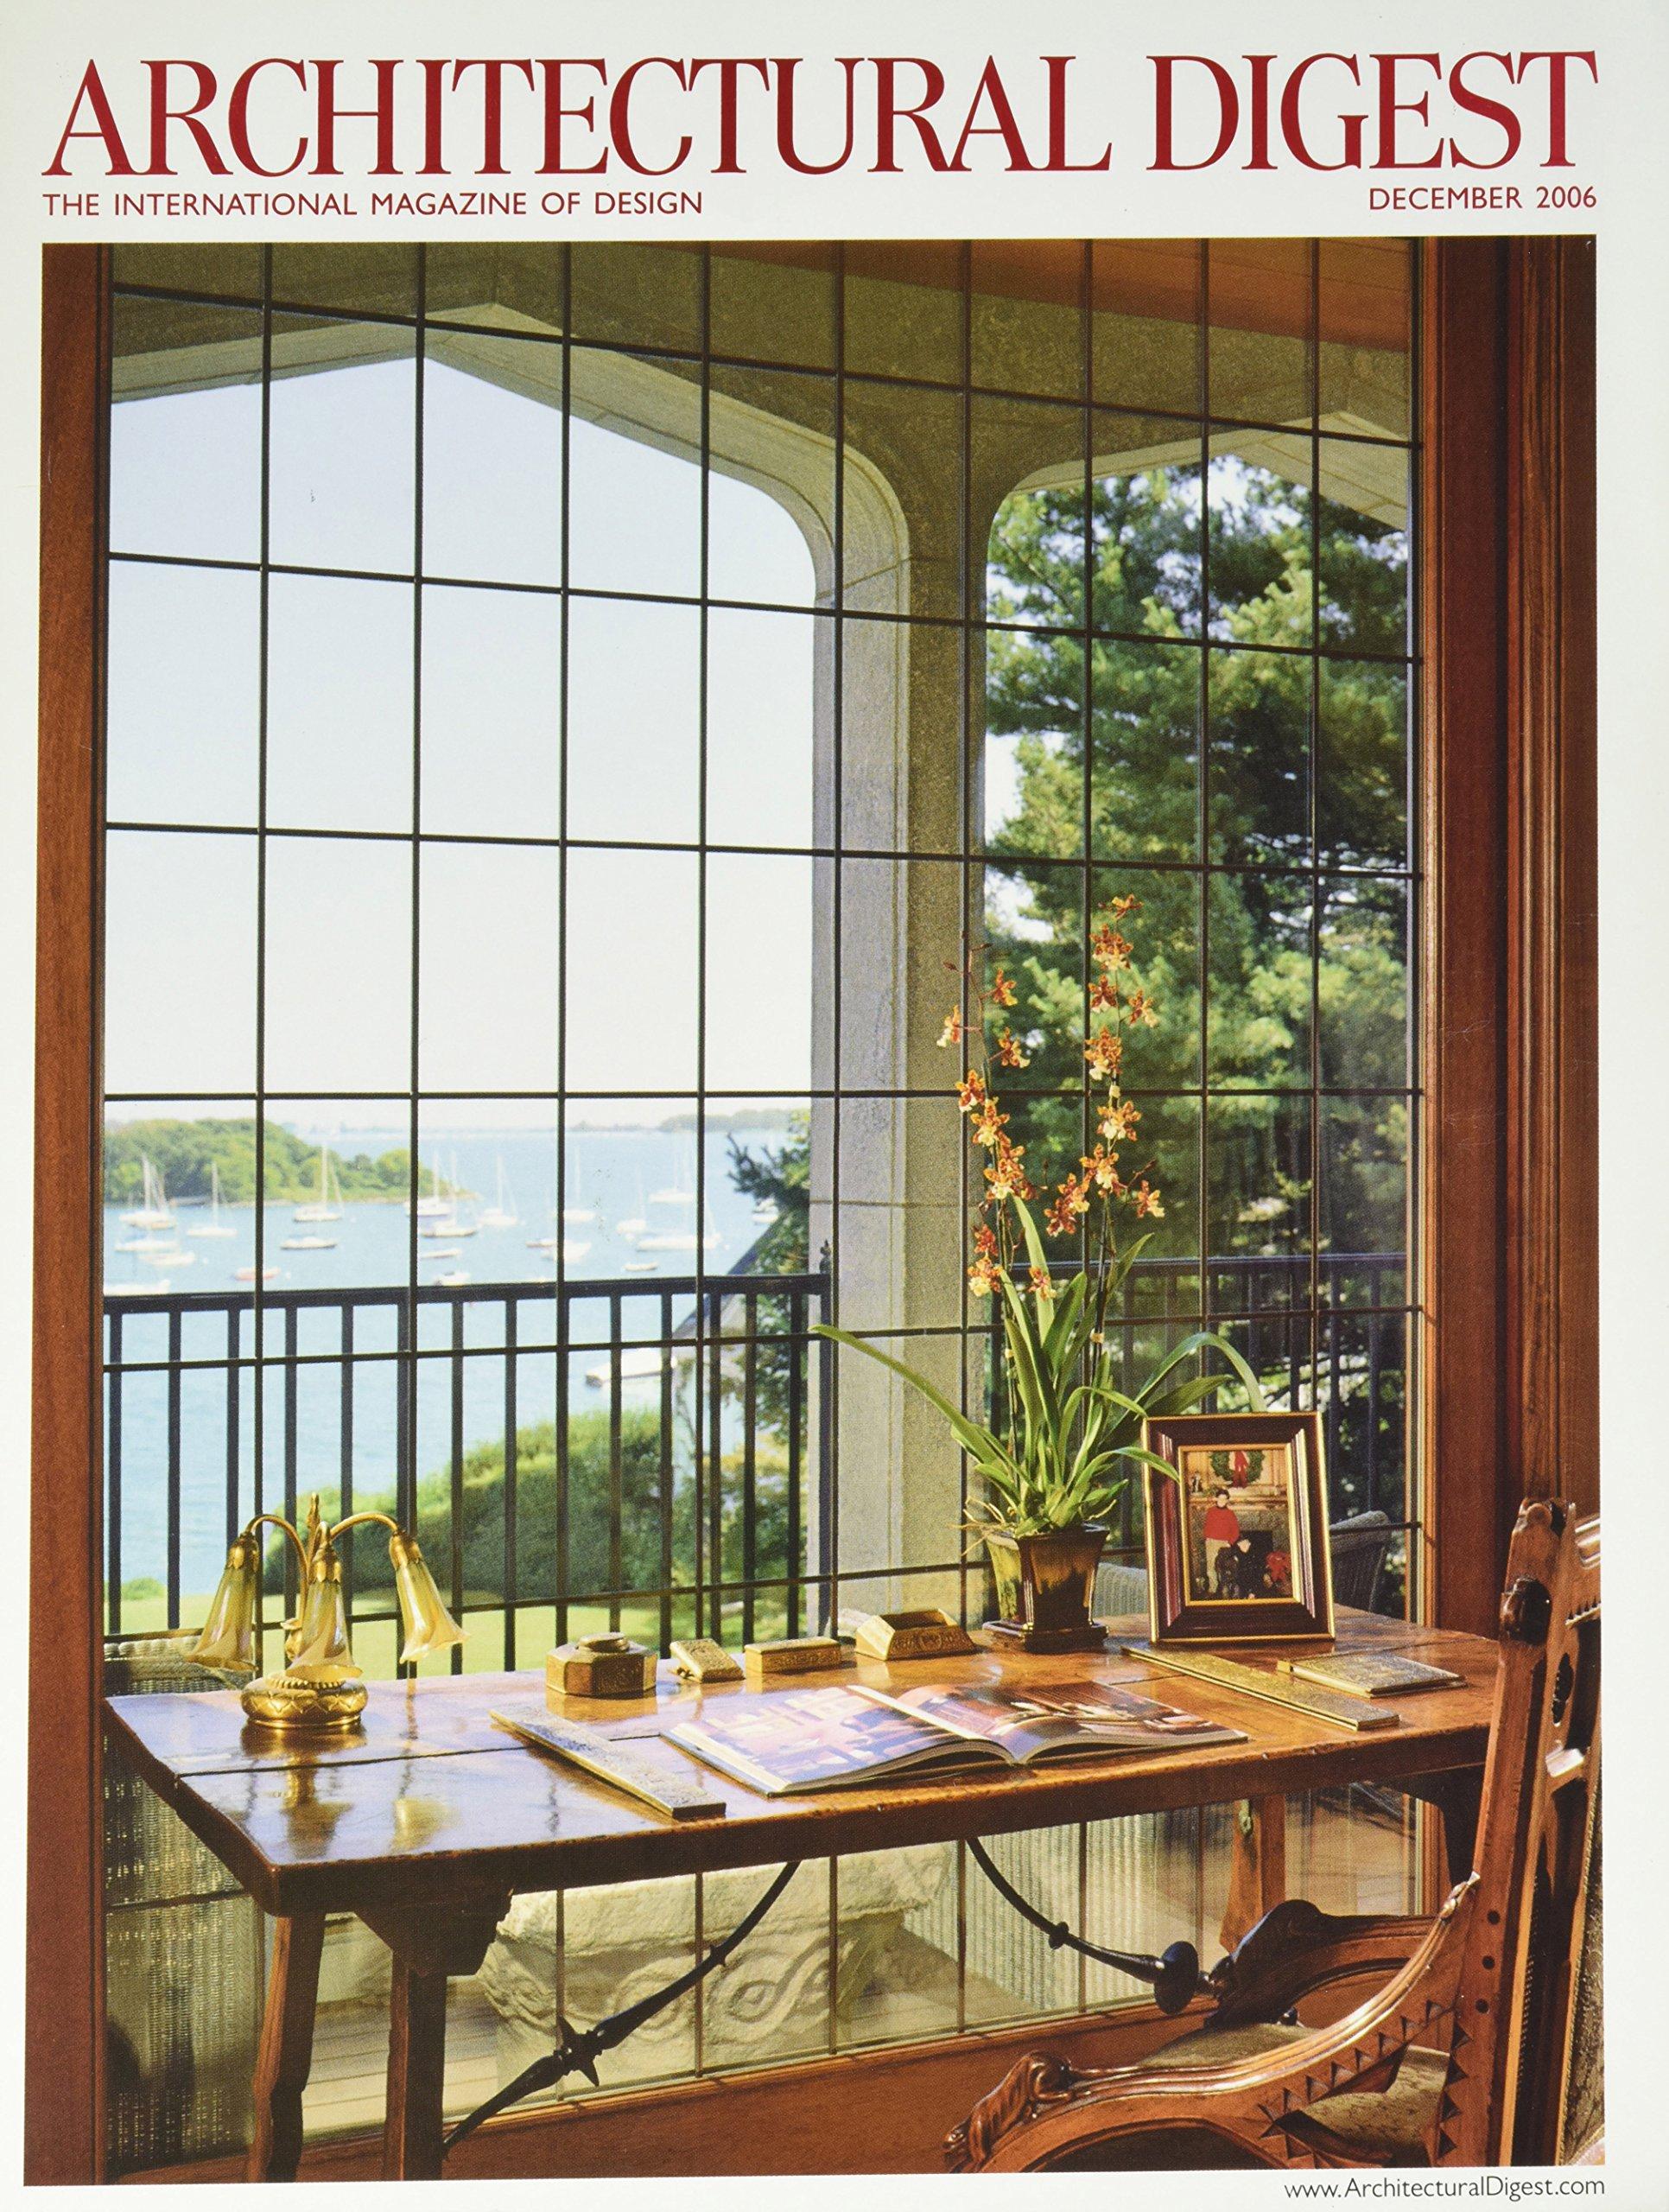 Download ARCHITECTURAL DIGEST: THE INTERNATIONAL MAGAZINE OF DESIGN: December 2006, Volume 63 No. 12 (Estates For Sale, DECO in Florida, Carleton Varney in NYC, Vol. 63, #12) pdf epub